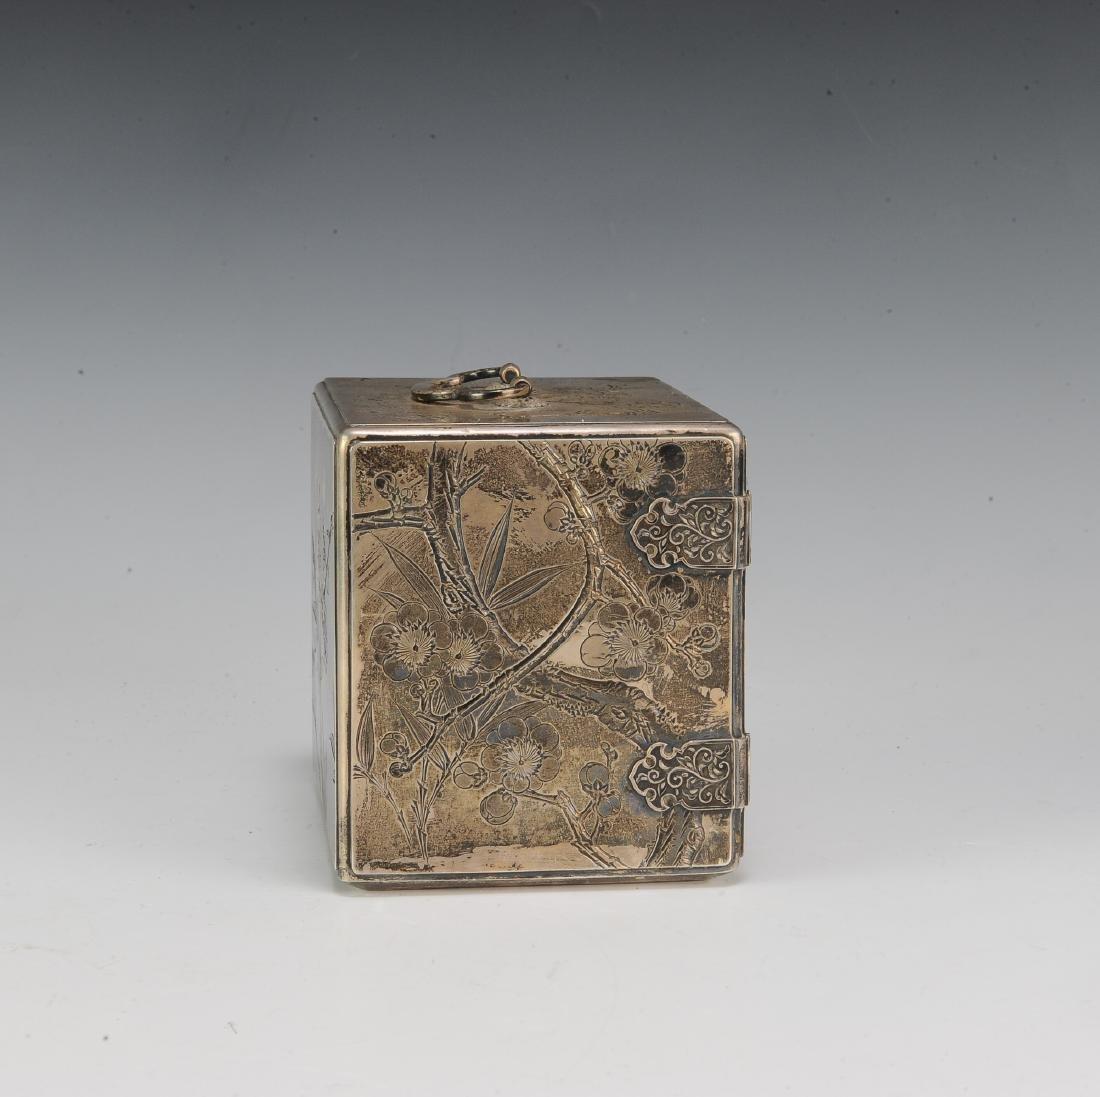 Japanese Silver Scholar's Box, 19th Century - 3